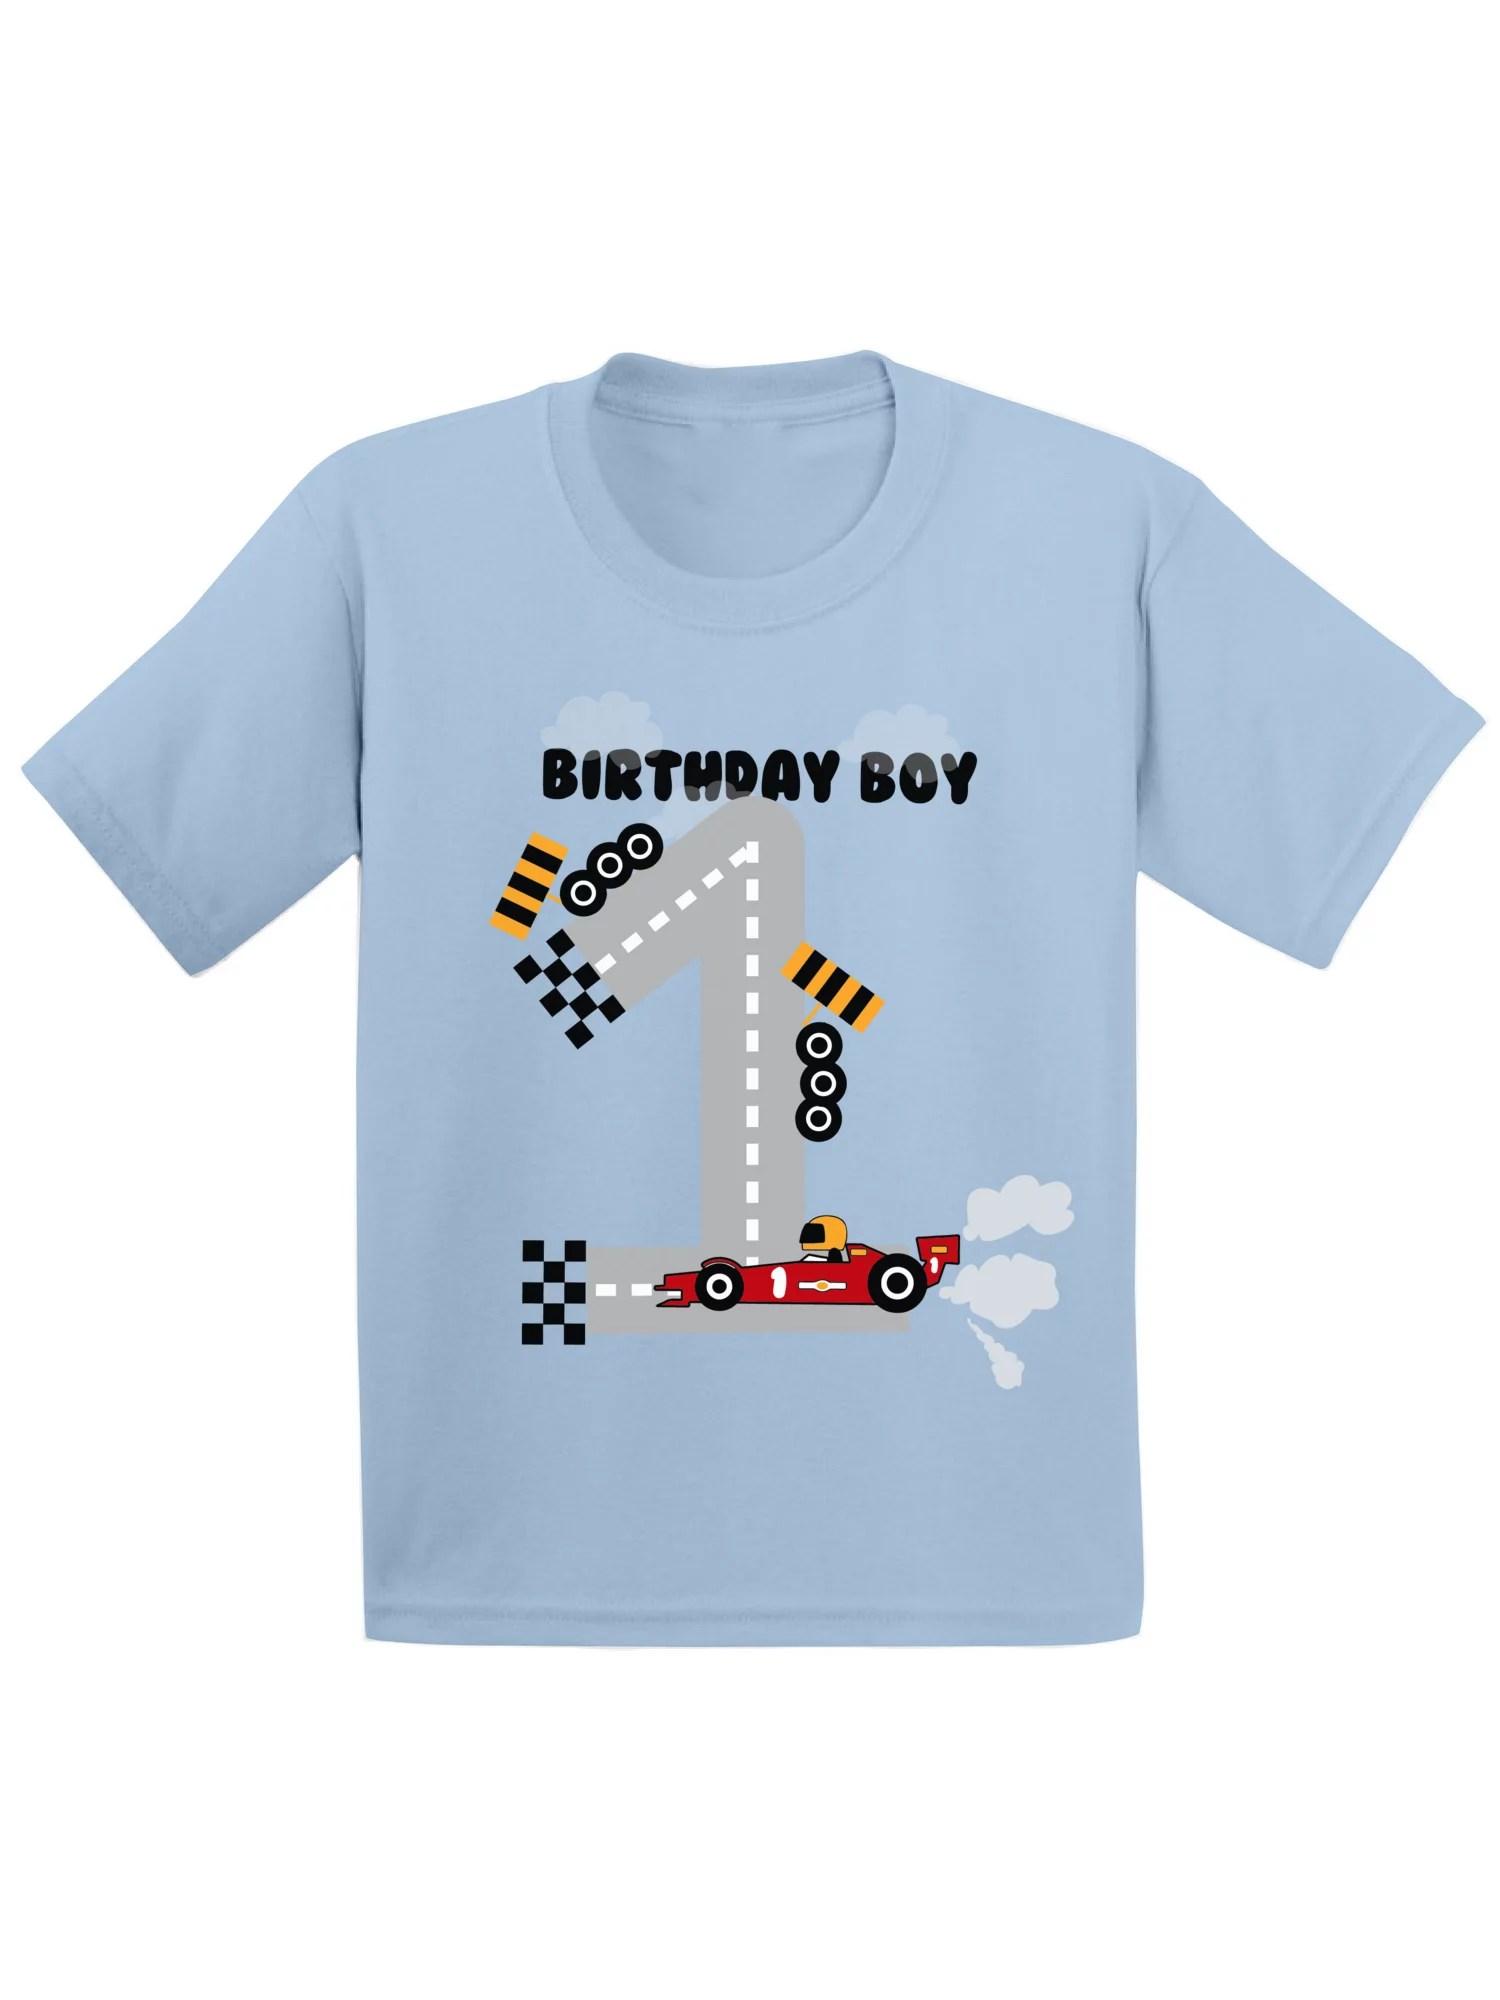 Awkward Styles Awkward Styles Birthday Boy Race Car Infant Shirt Birthday Gifts For 1 Year Old Baby Boy Race Car Birthday Party For Boys 1st Birthday Tshirt For Baby First Birthday